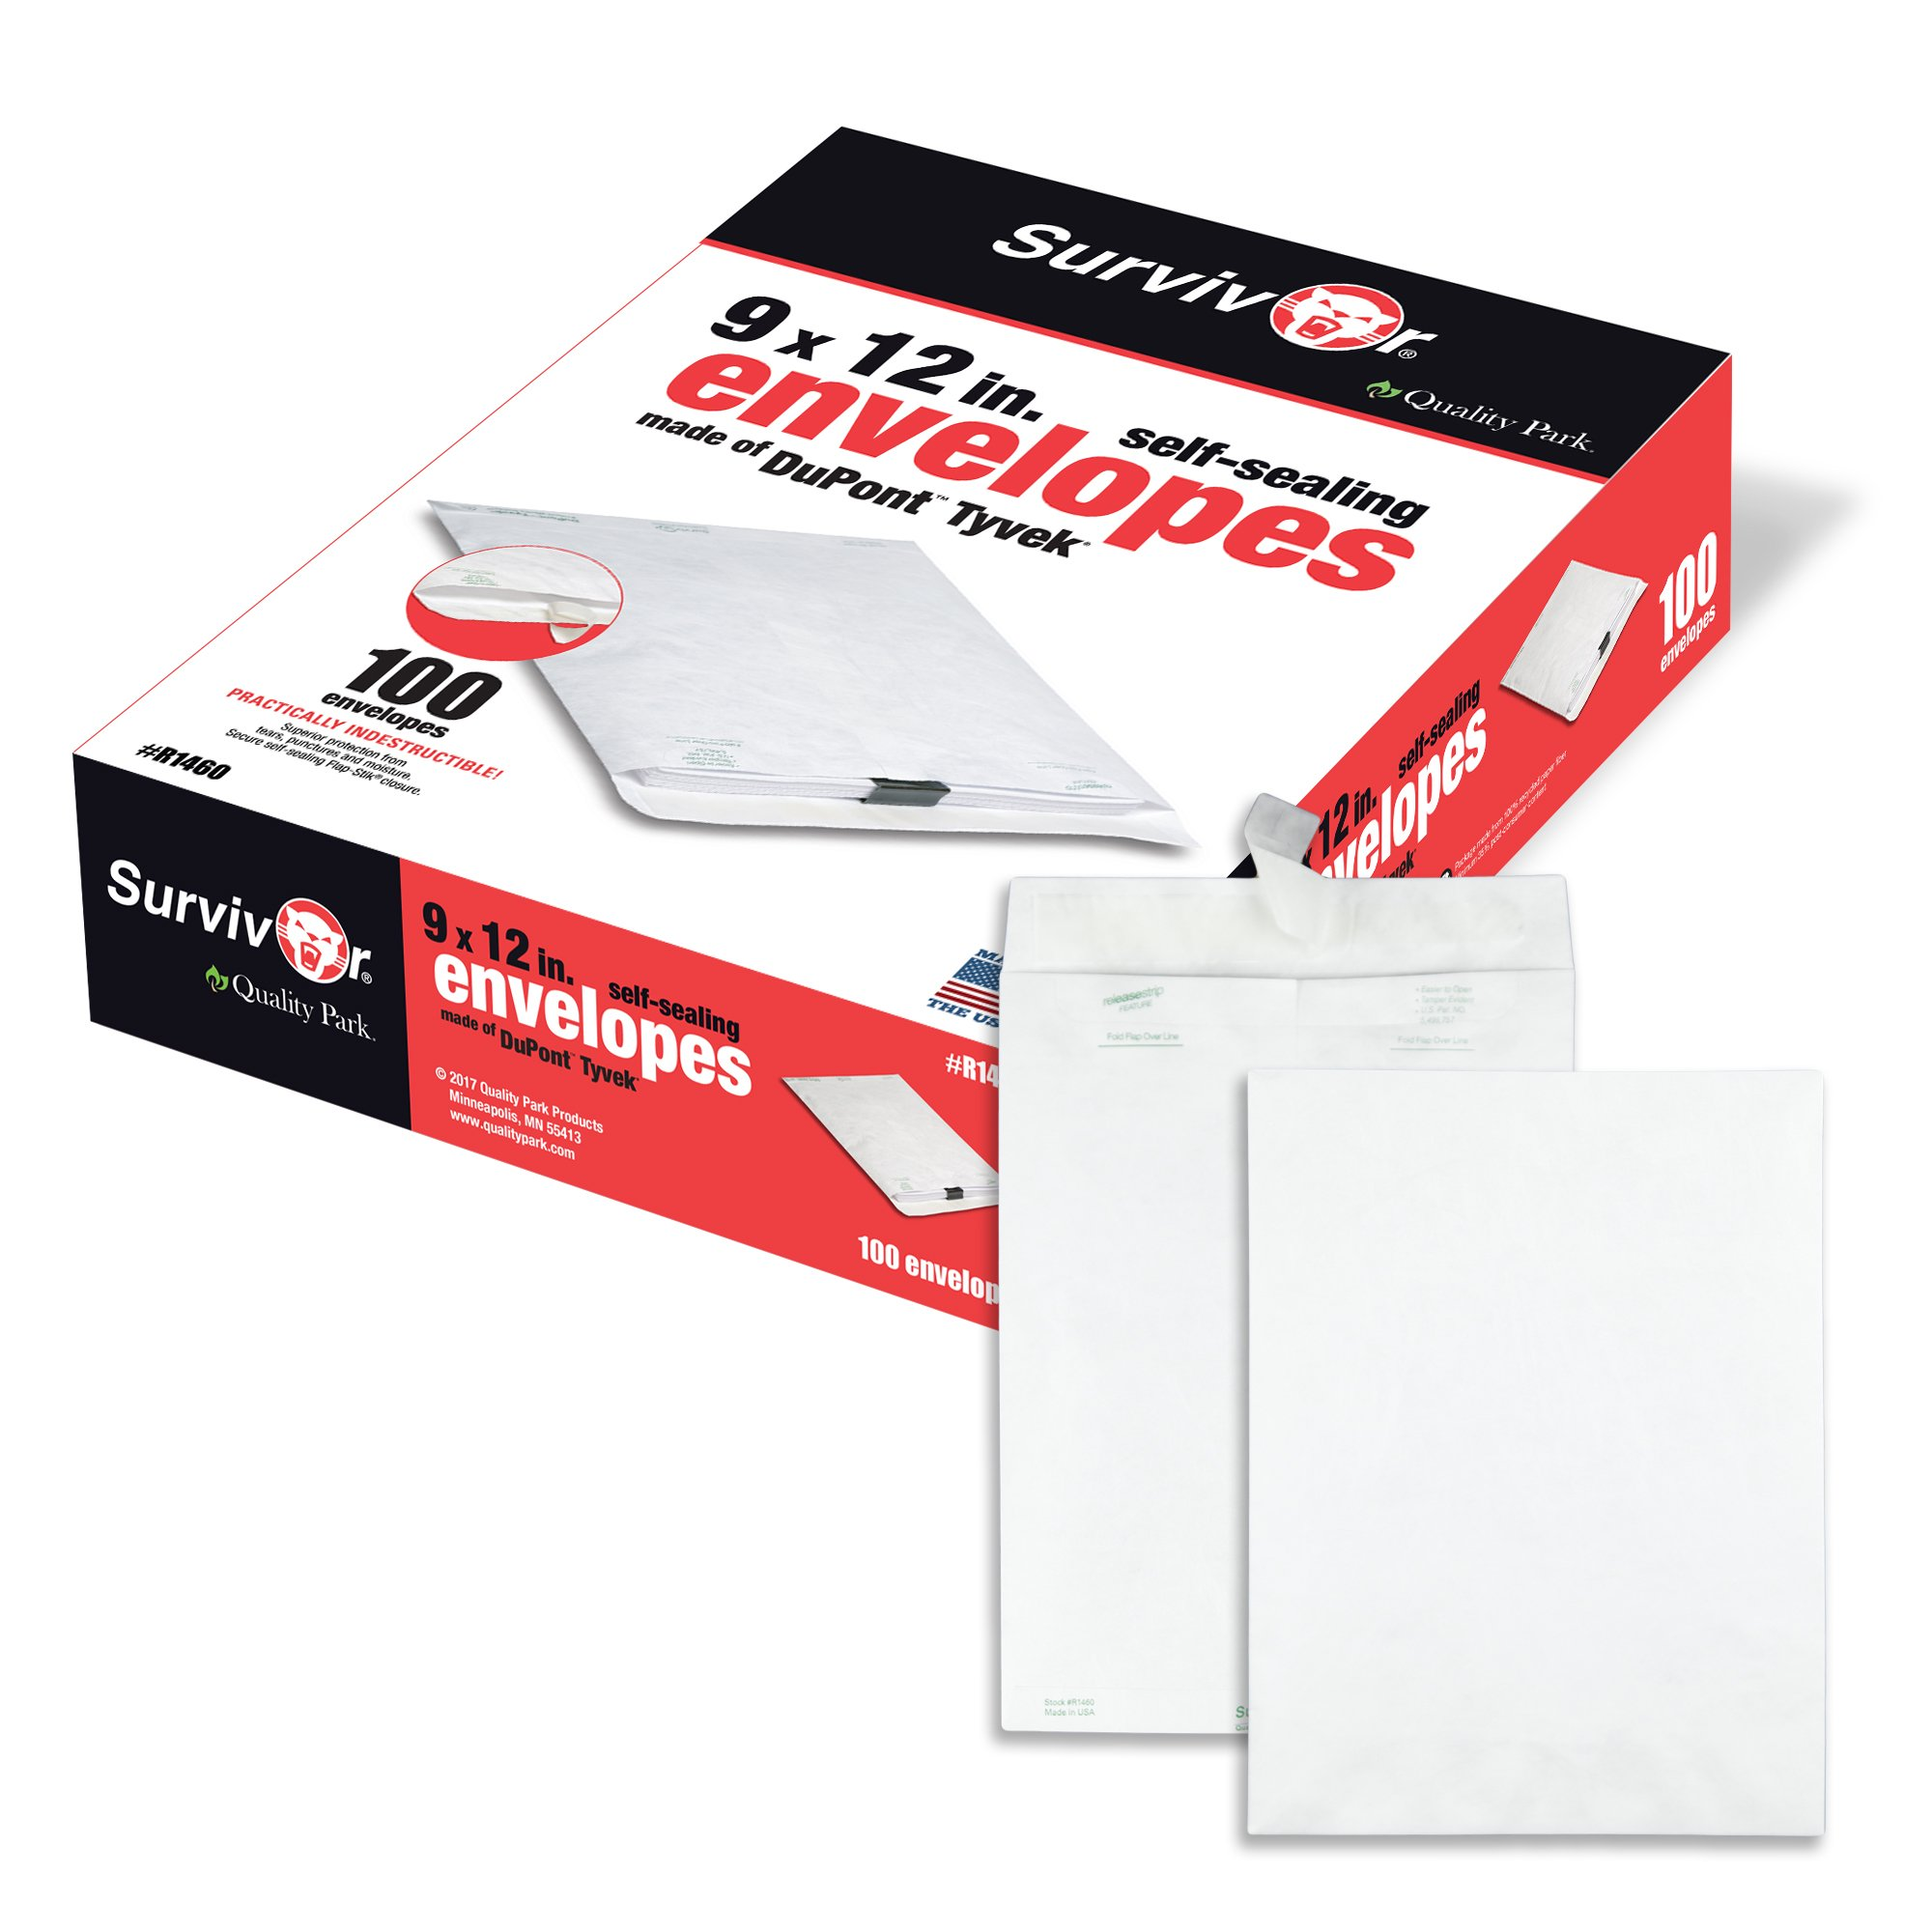 Quality Park Survivor R1460 Tyvek Mailer, 9 x 12, White (Box of 100)